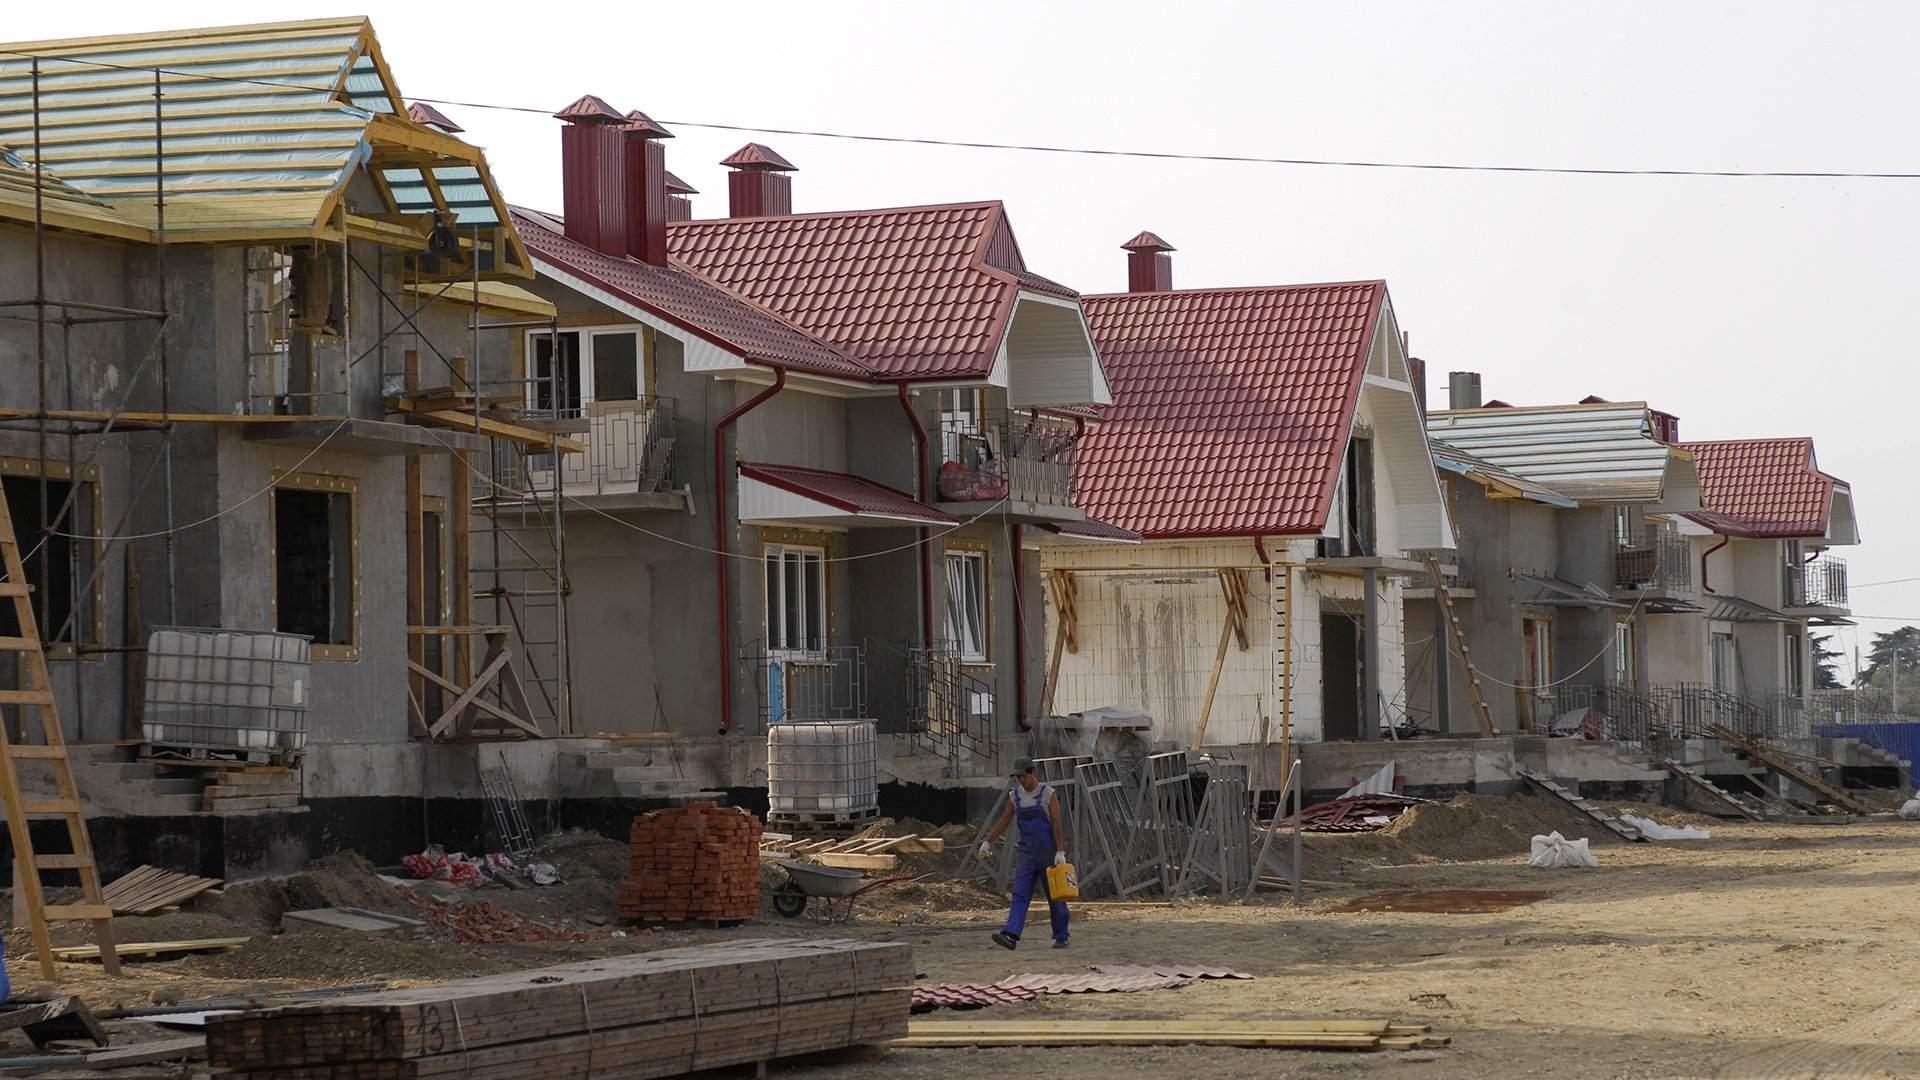 Ипотека на строительство частного дома в кирове